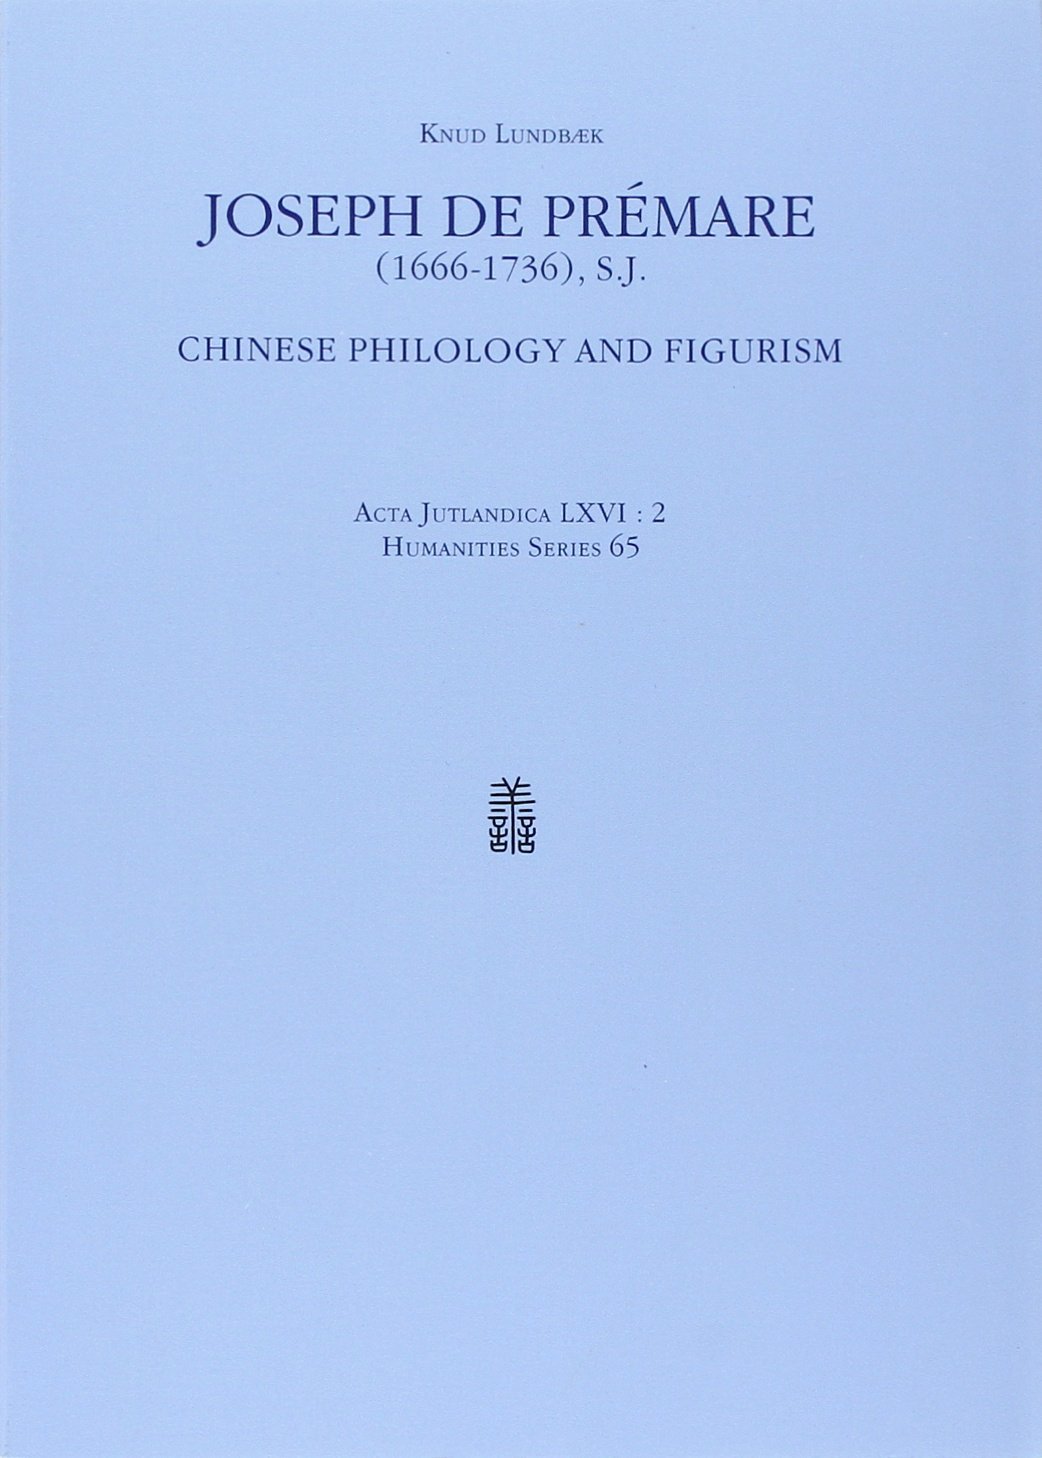 Joseph de Premare (1666-1736): Chinese Philology and Figurism (ACTA JUTLANDICA) (v. 65) by Aarhus University Press